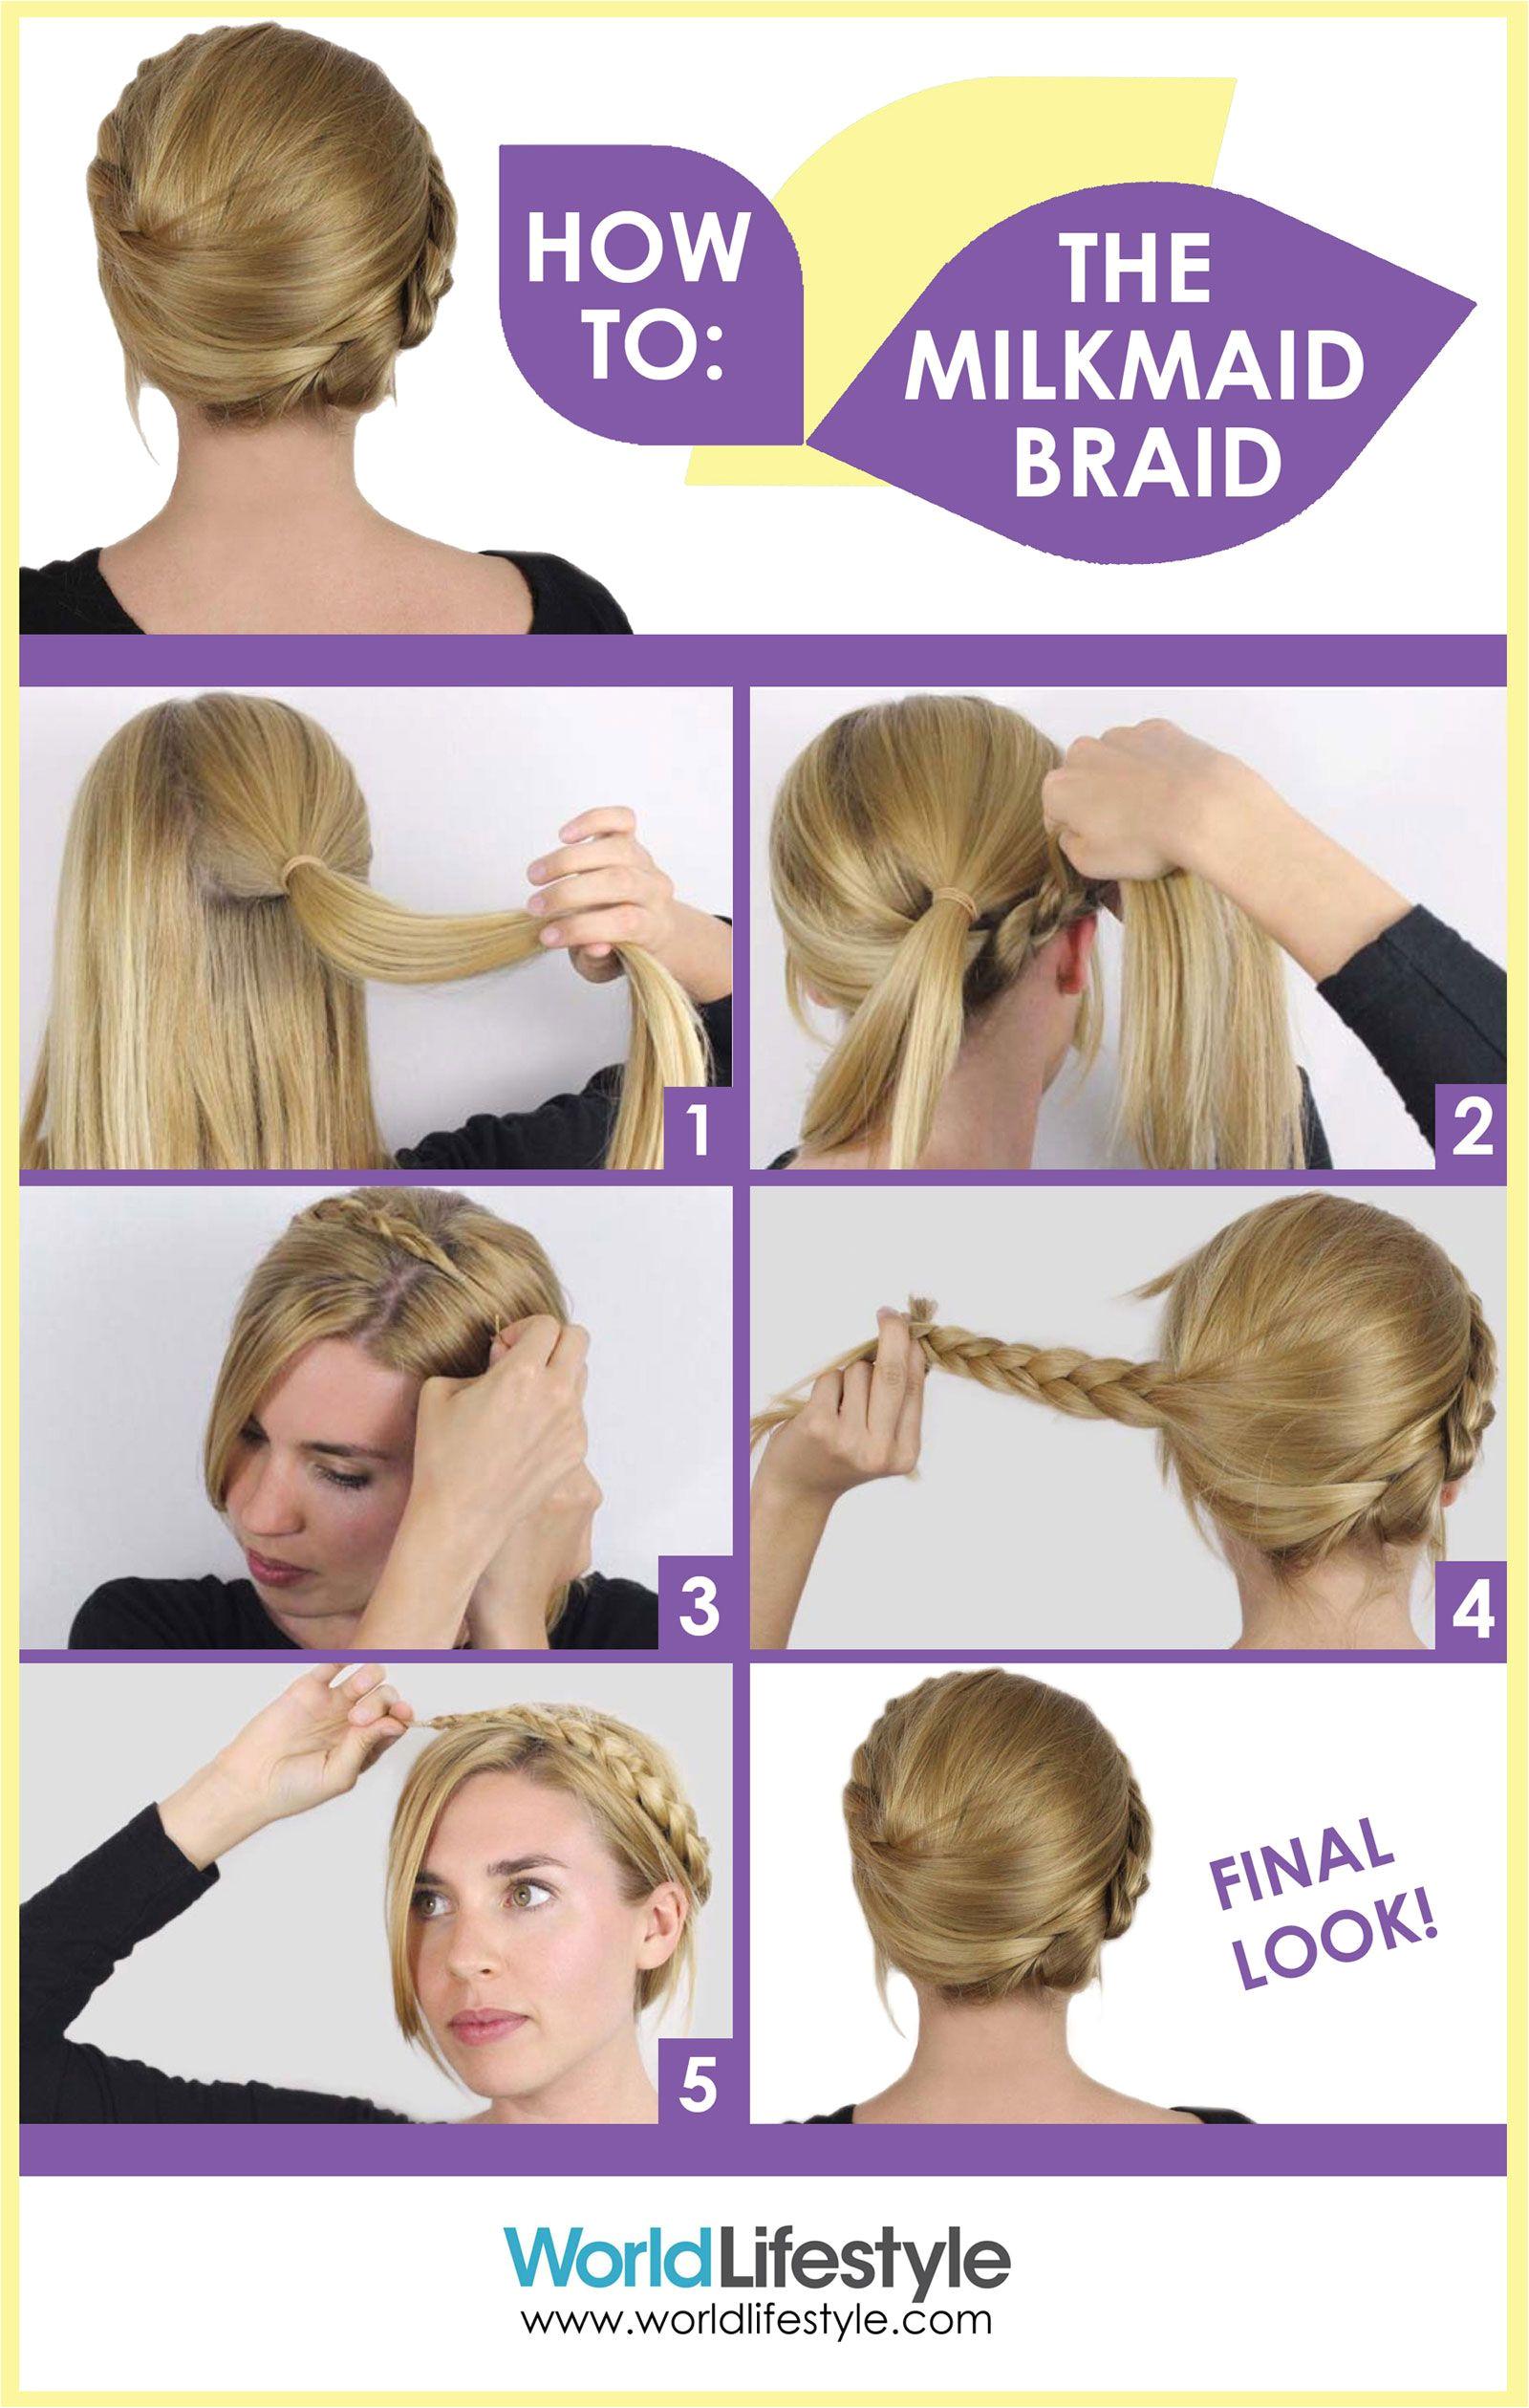 Gym Hairstyles Youtube How to Do An Easy Milkmaid Braid with Hair Guru Sasha